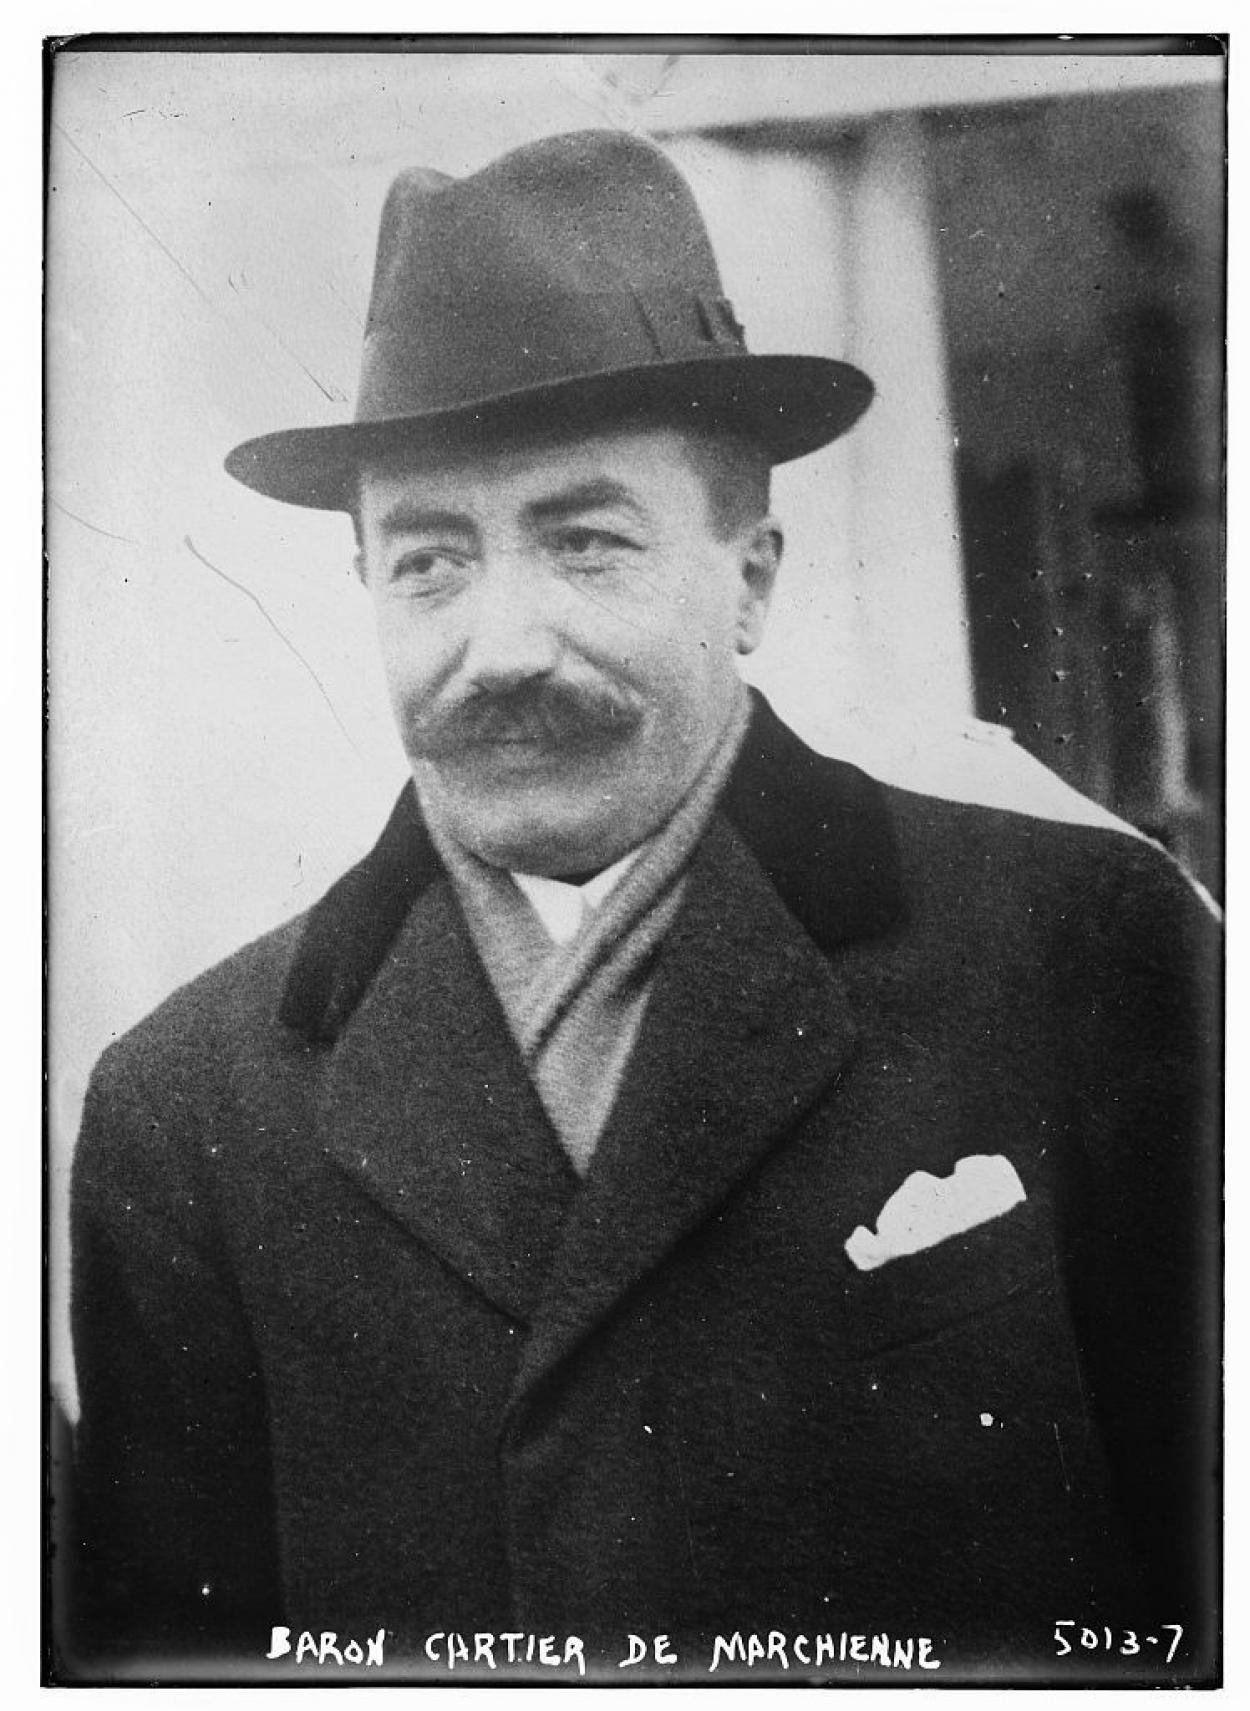 emile_de_cartier_de_marchienne_circa_1918.jpg